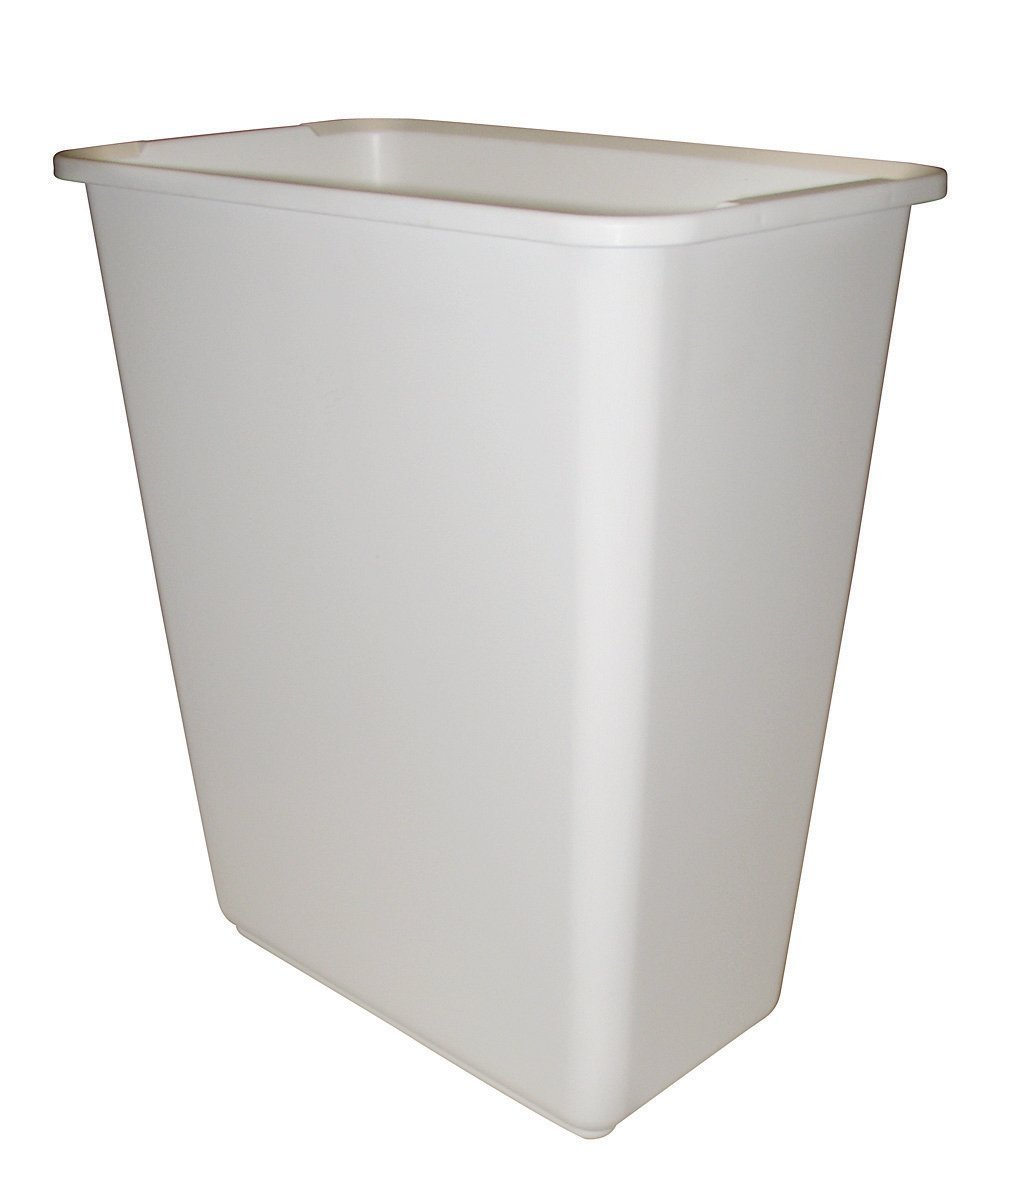 Rev-A-Shelf Replacement Waste Bin White-30 Quart